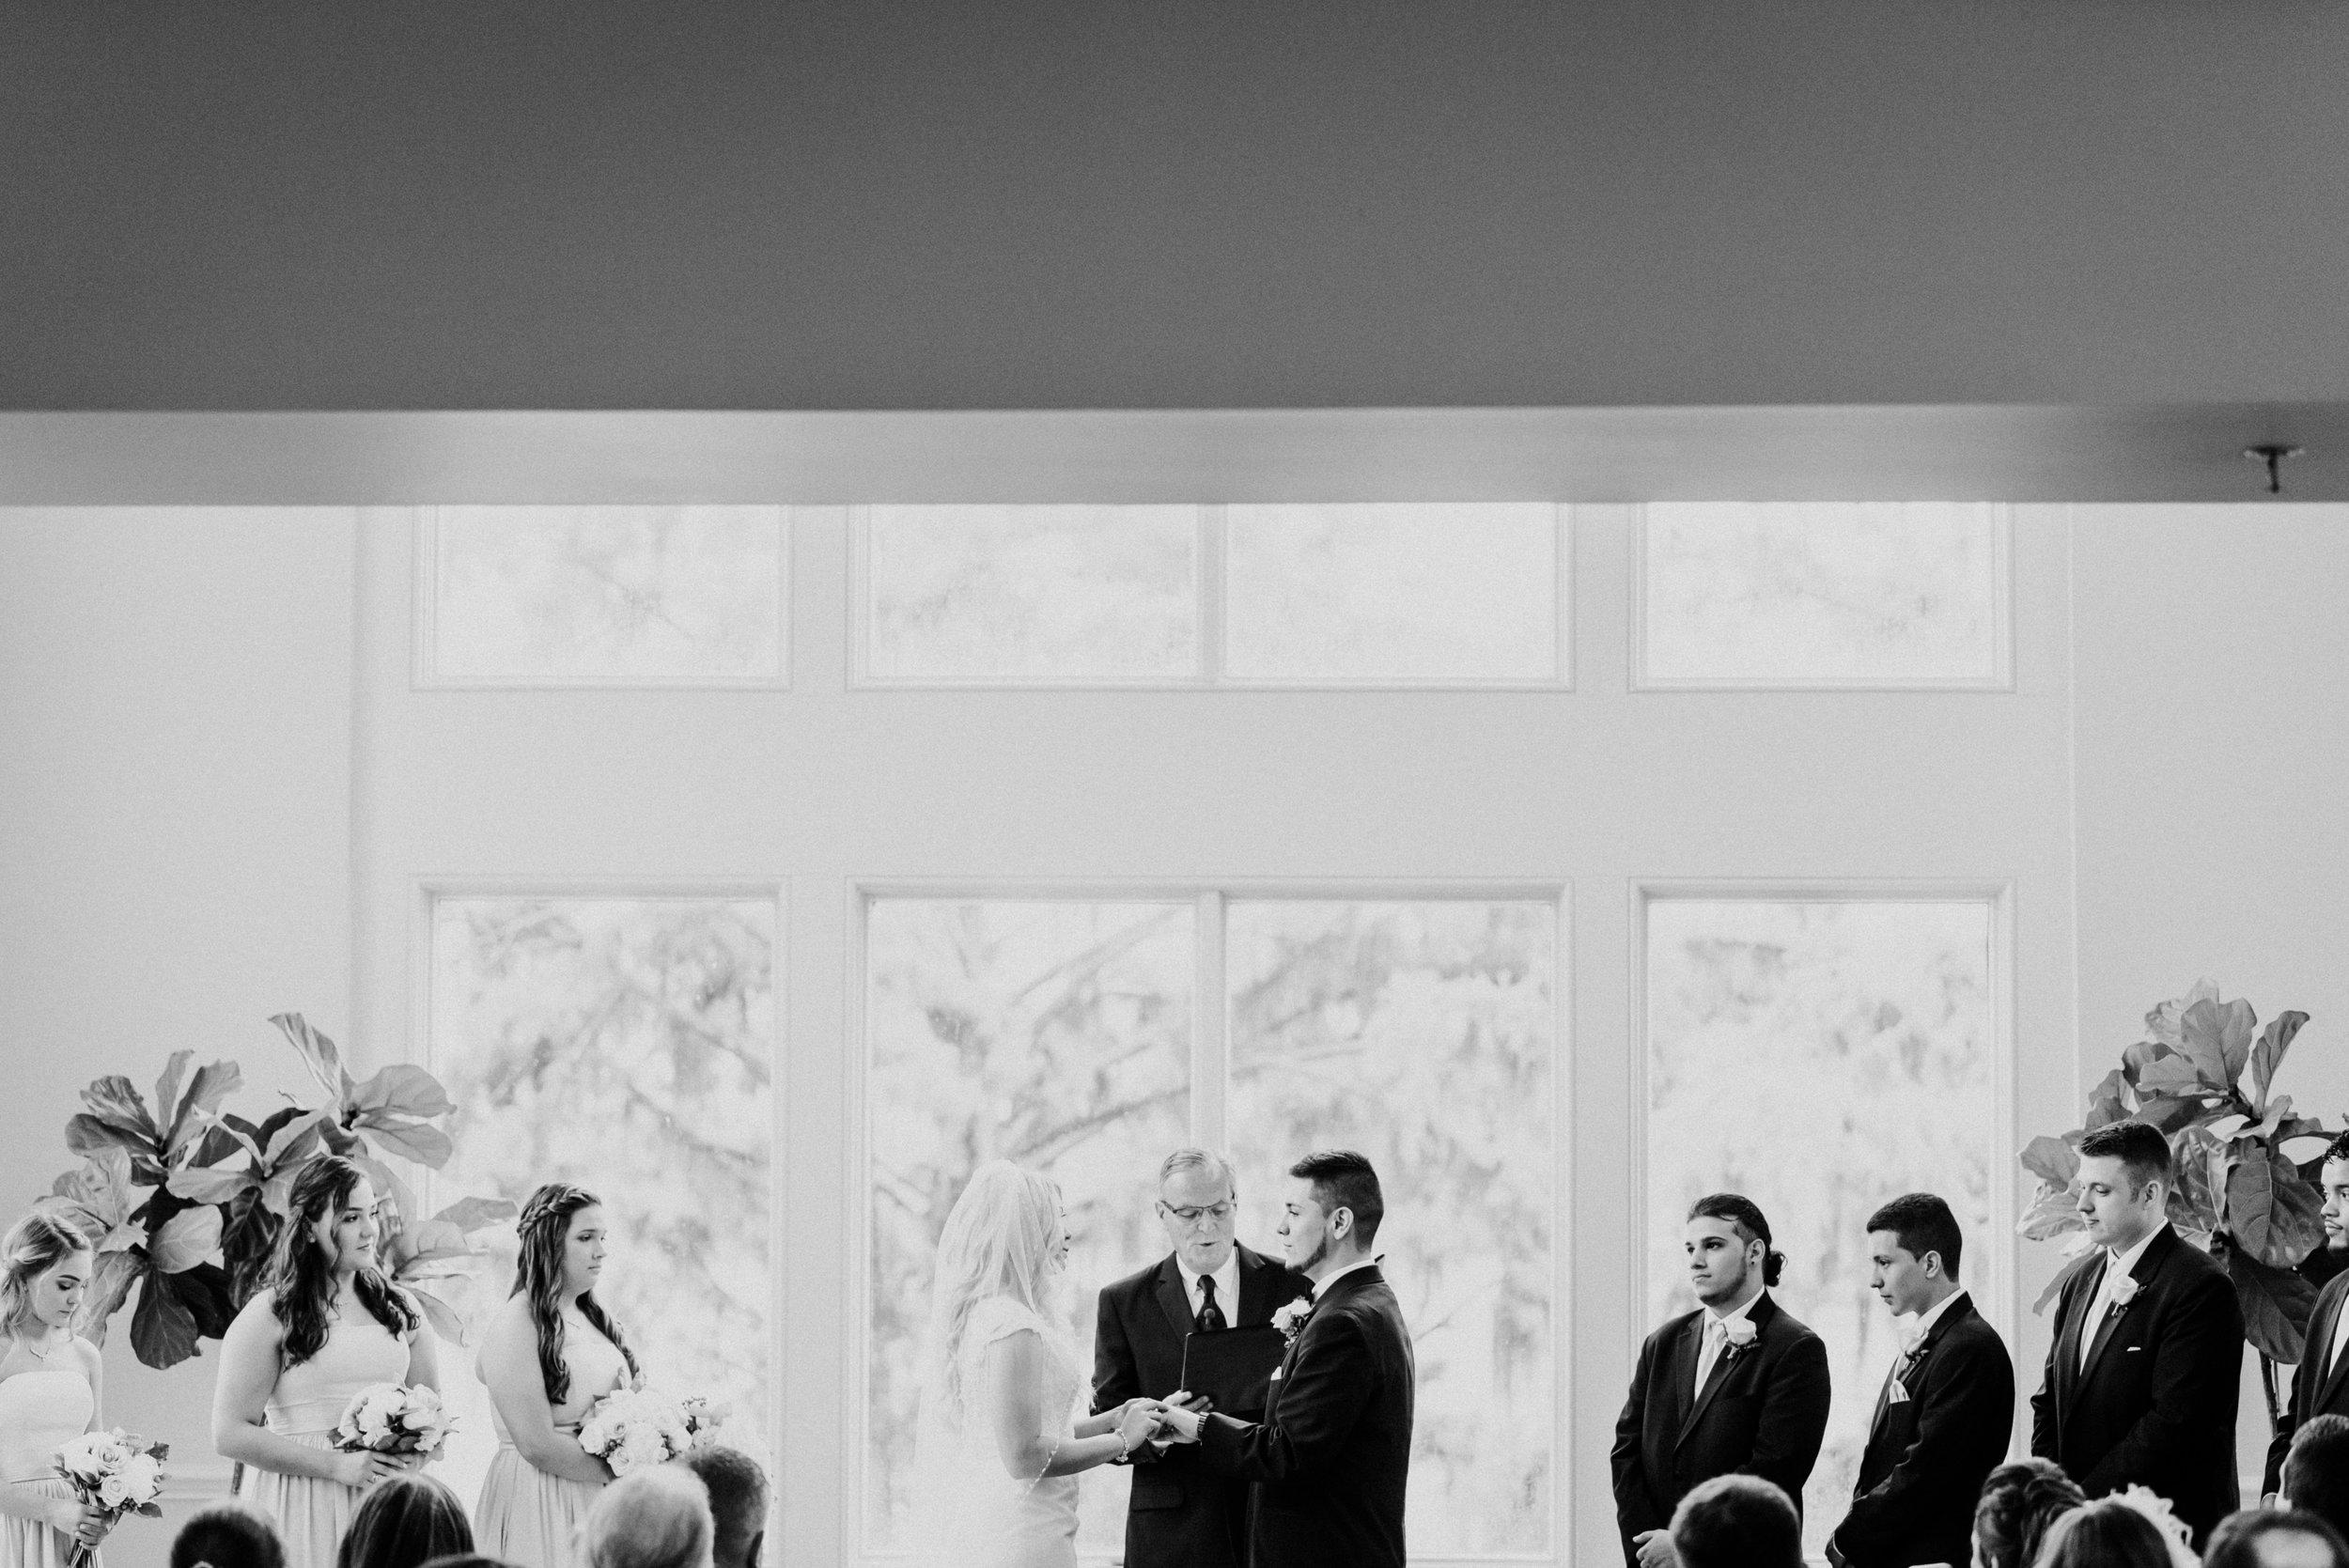 KateTaramykinStudios-Portfolio-Weddings-LeuGardens-16.jpg